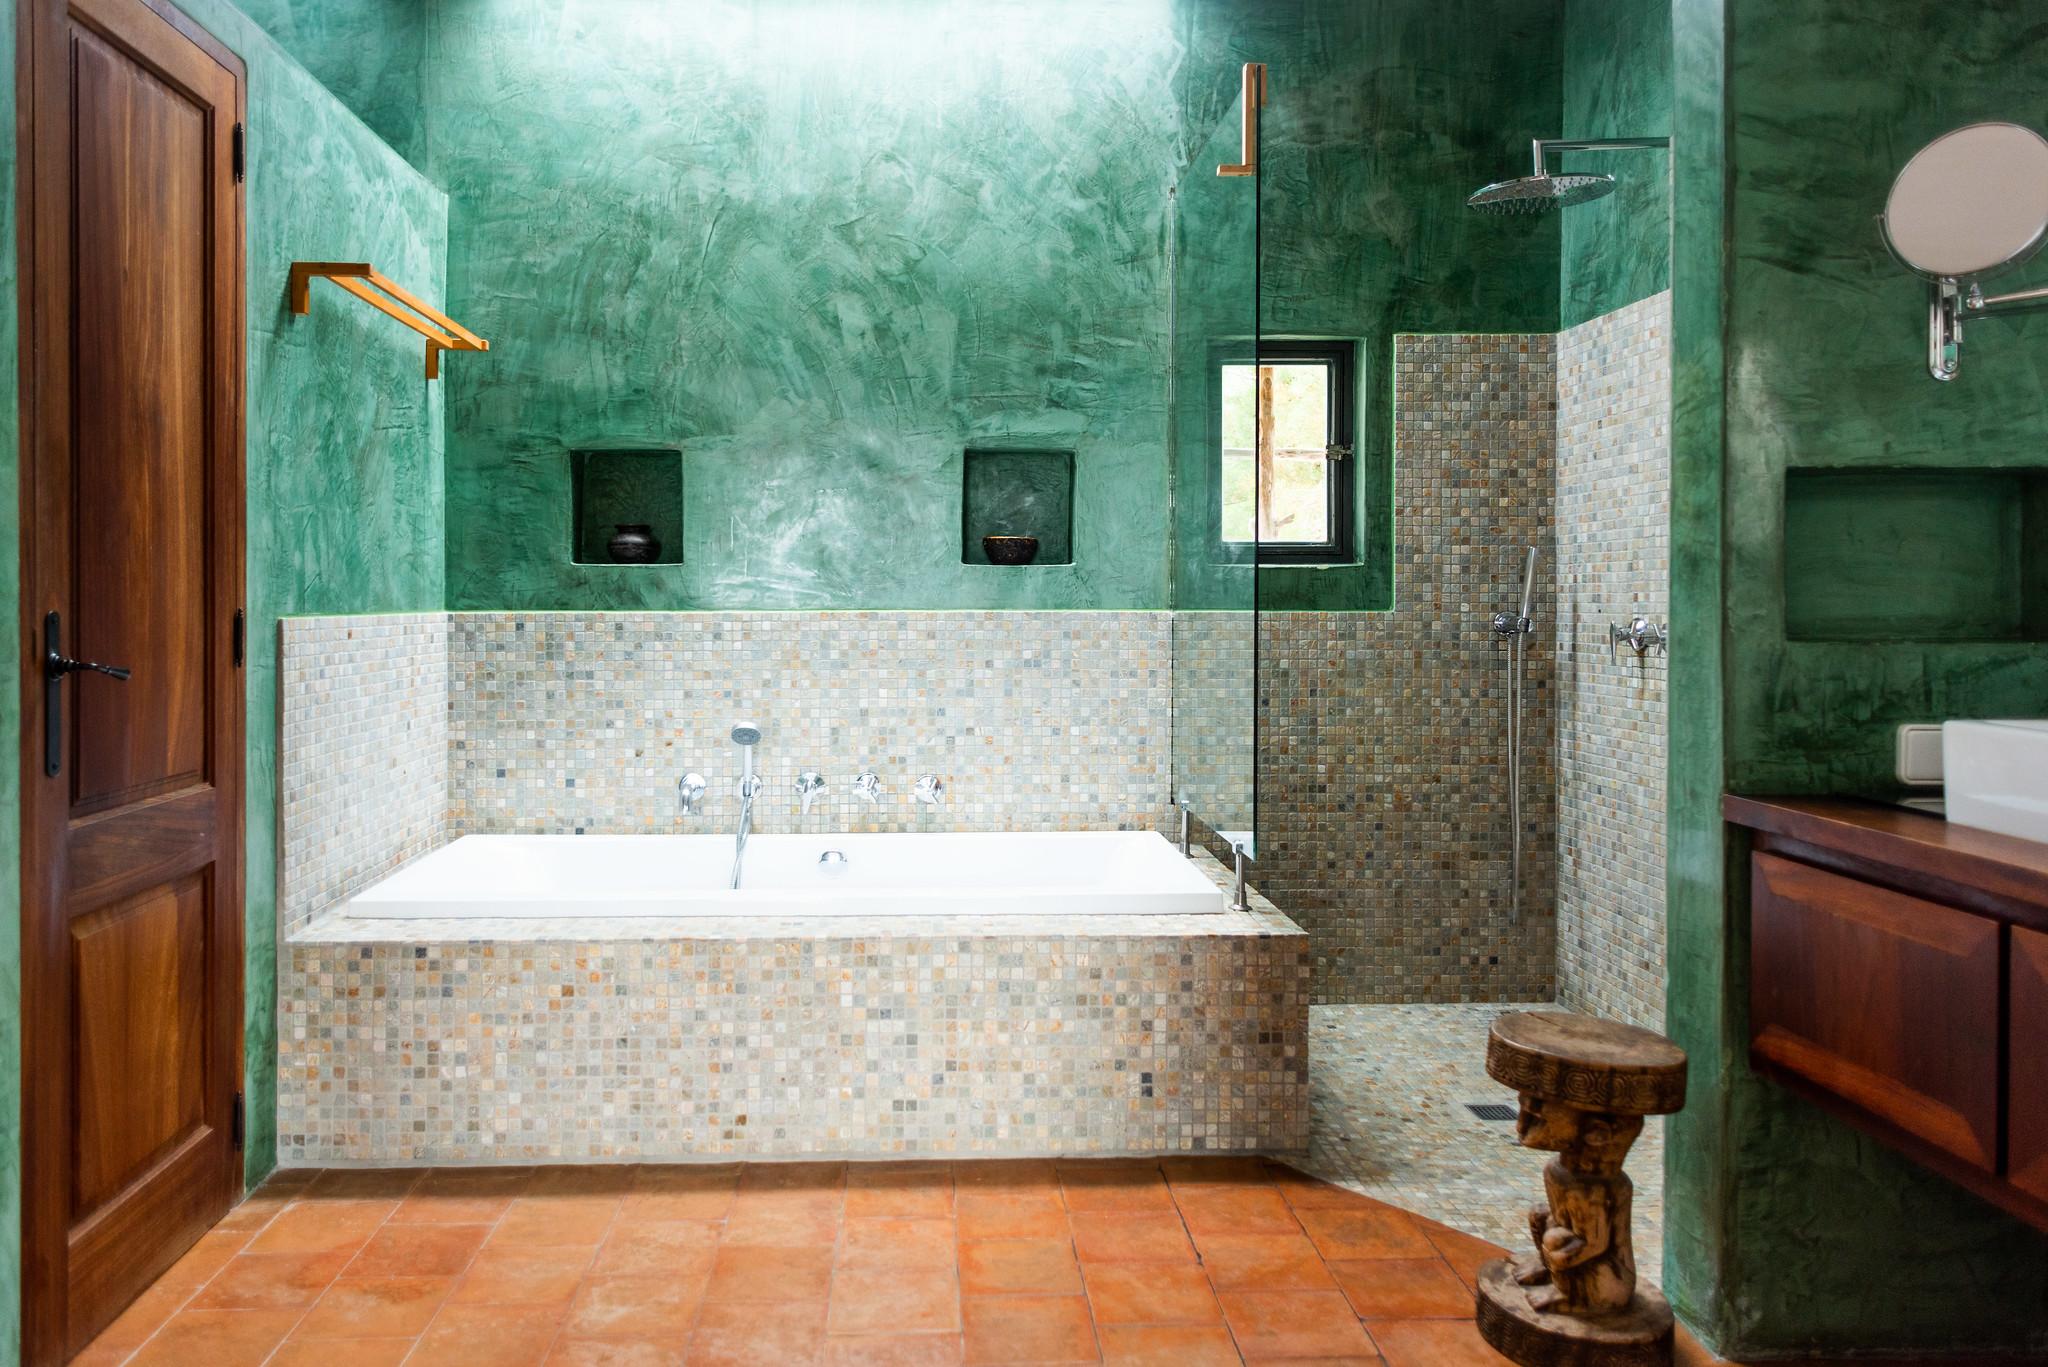 https://www.white-ibiza.com/wp-content/uploads/2020/05/white-ibiza-villas-can-lyra-interior-bathroom.jpg